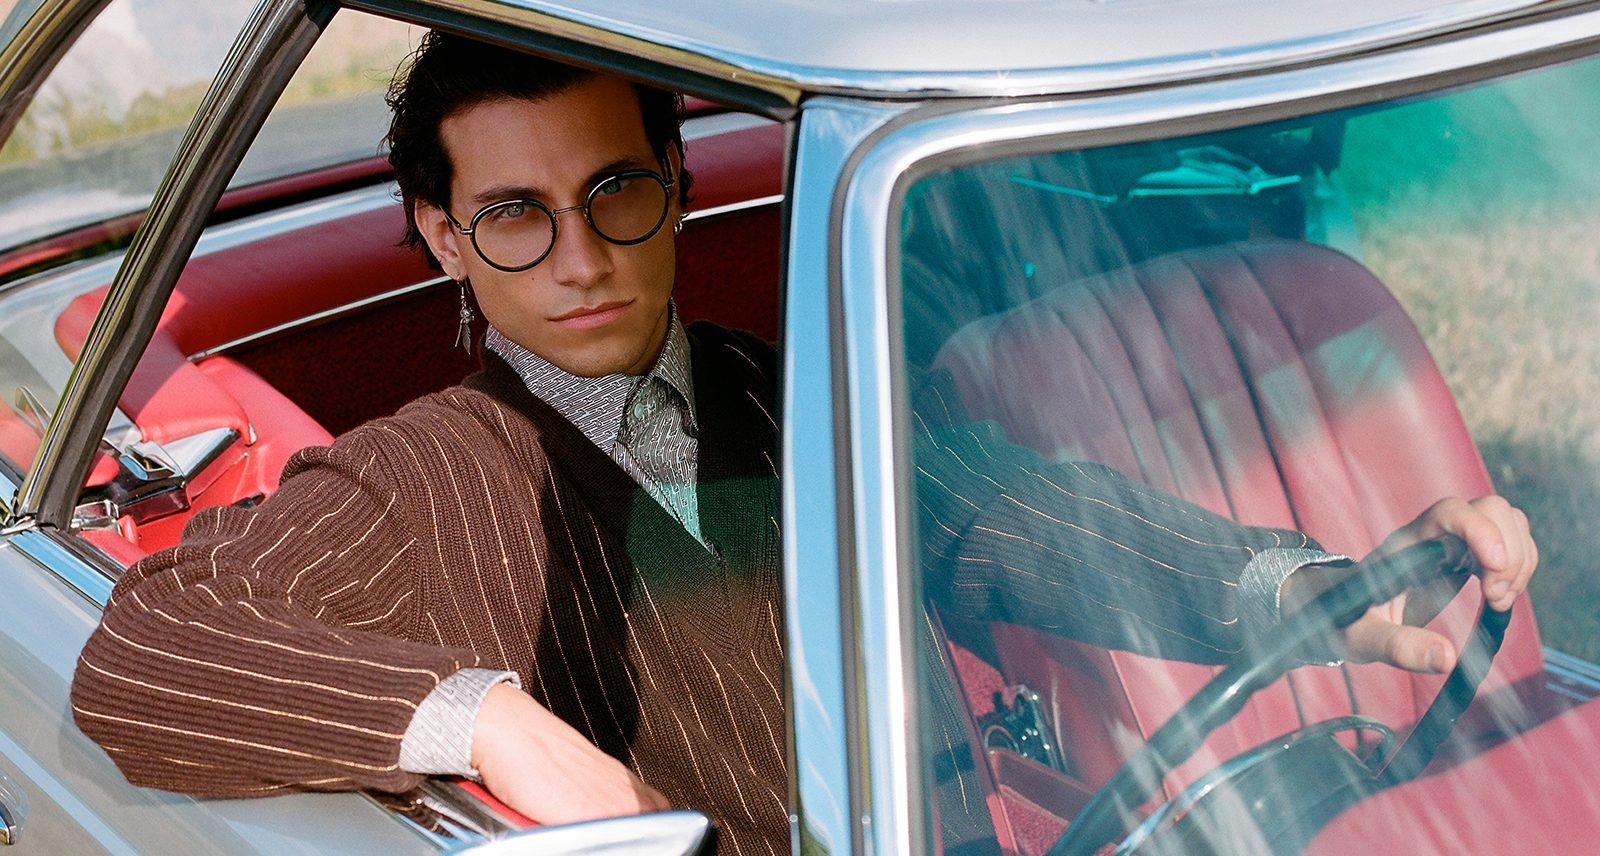 Watch Fendi's New Short Film Starring Riverdale's Rob Raco